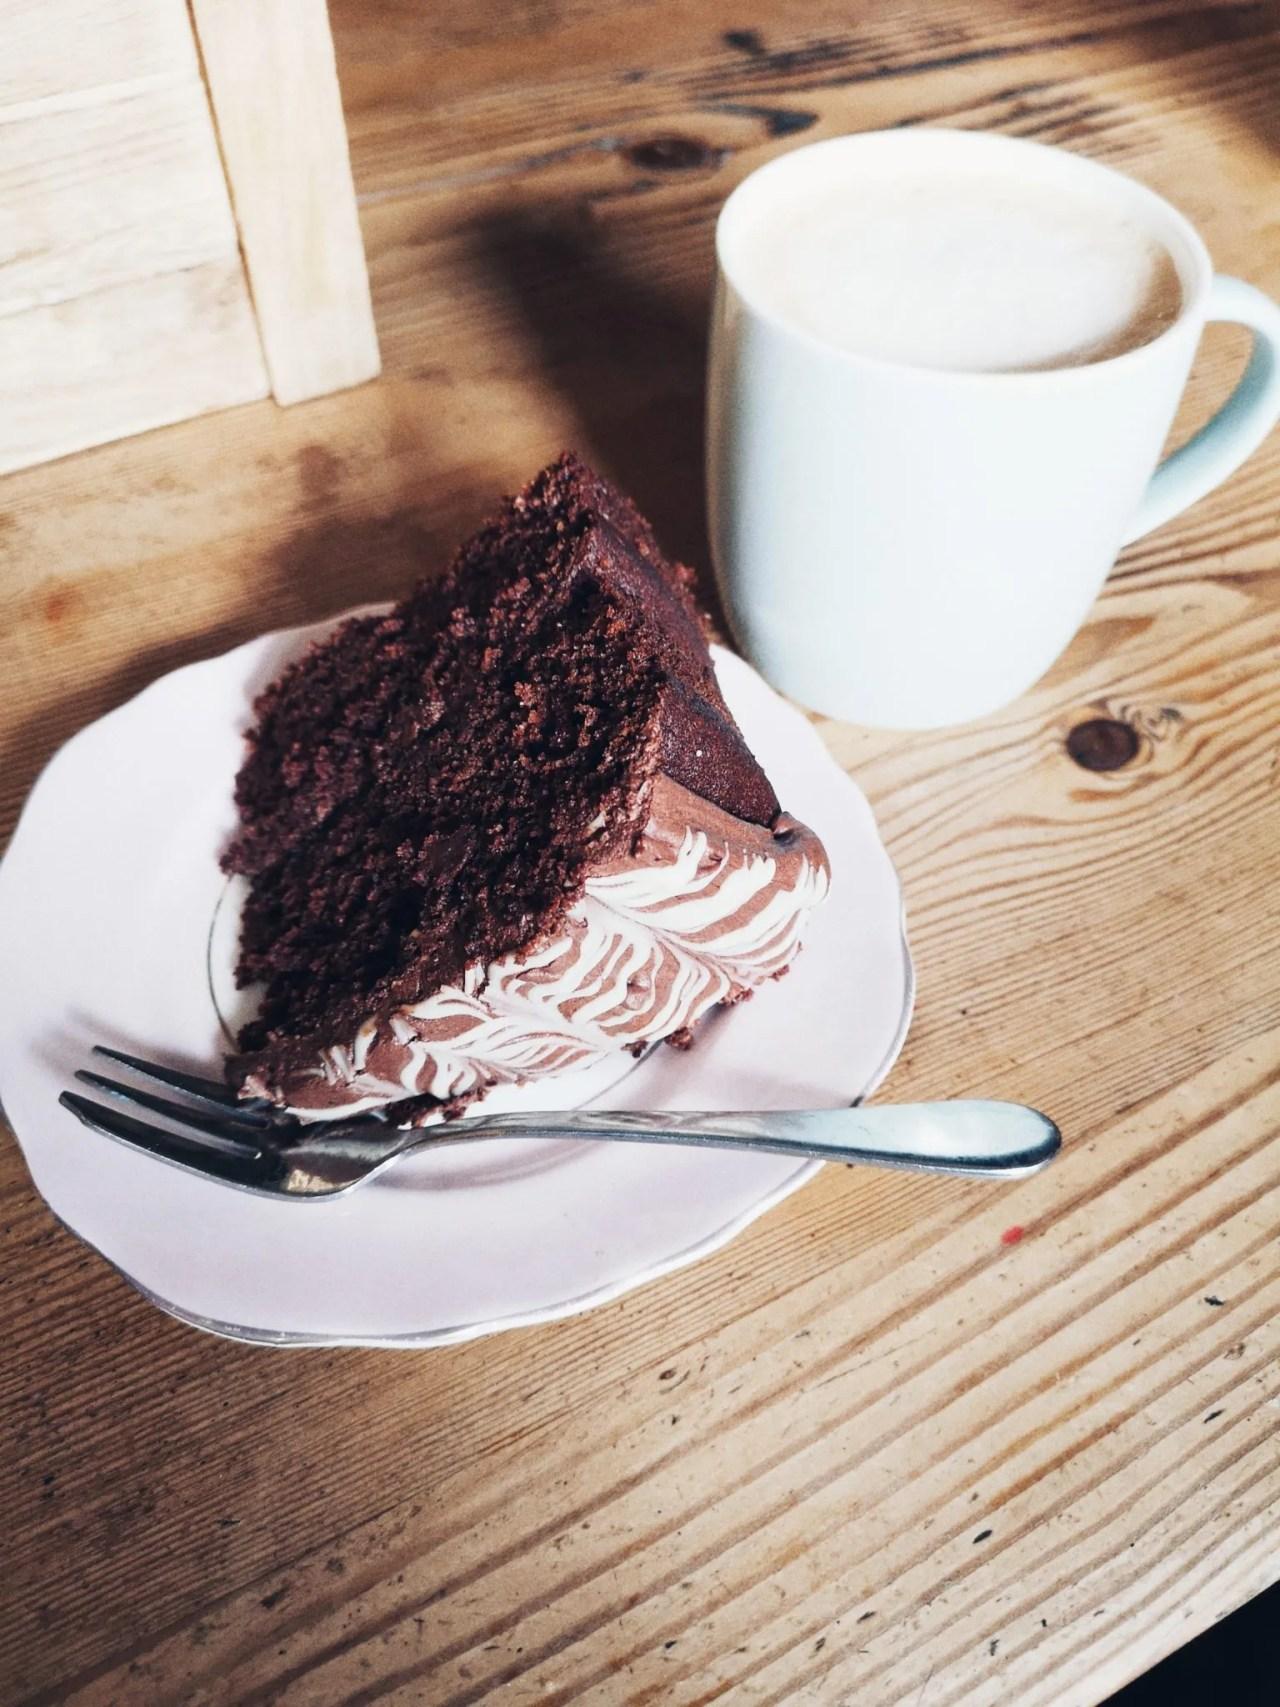 Vegan chocolate cake and coconut milk latte - The Style of Laura Jane